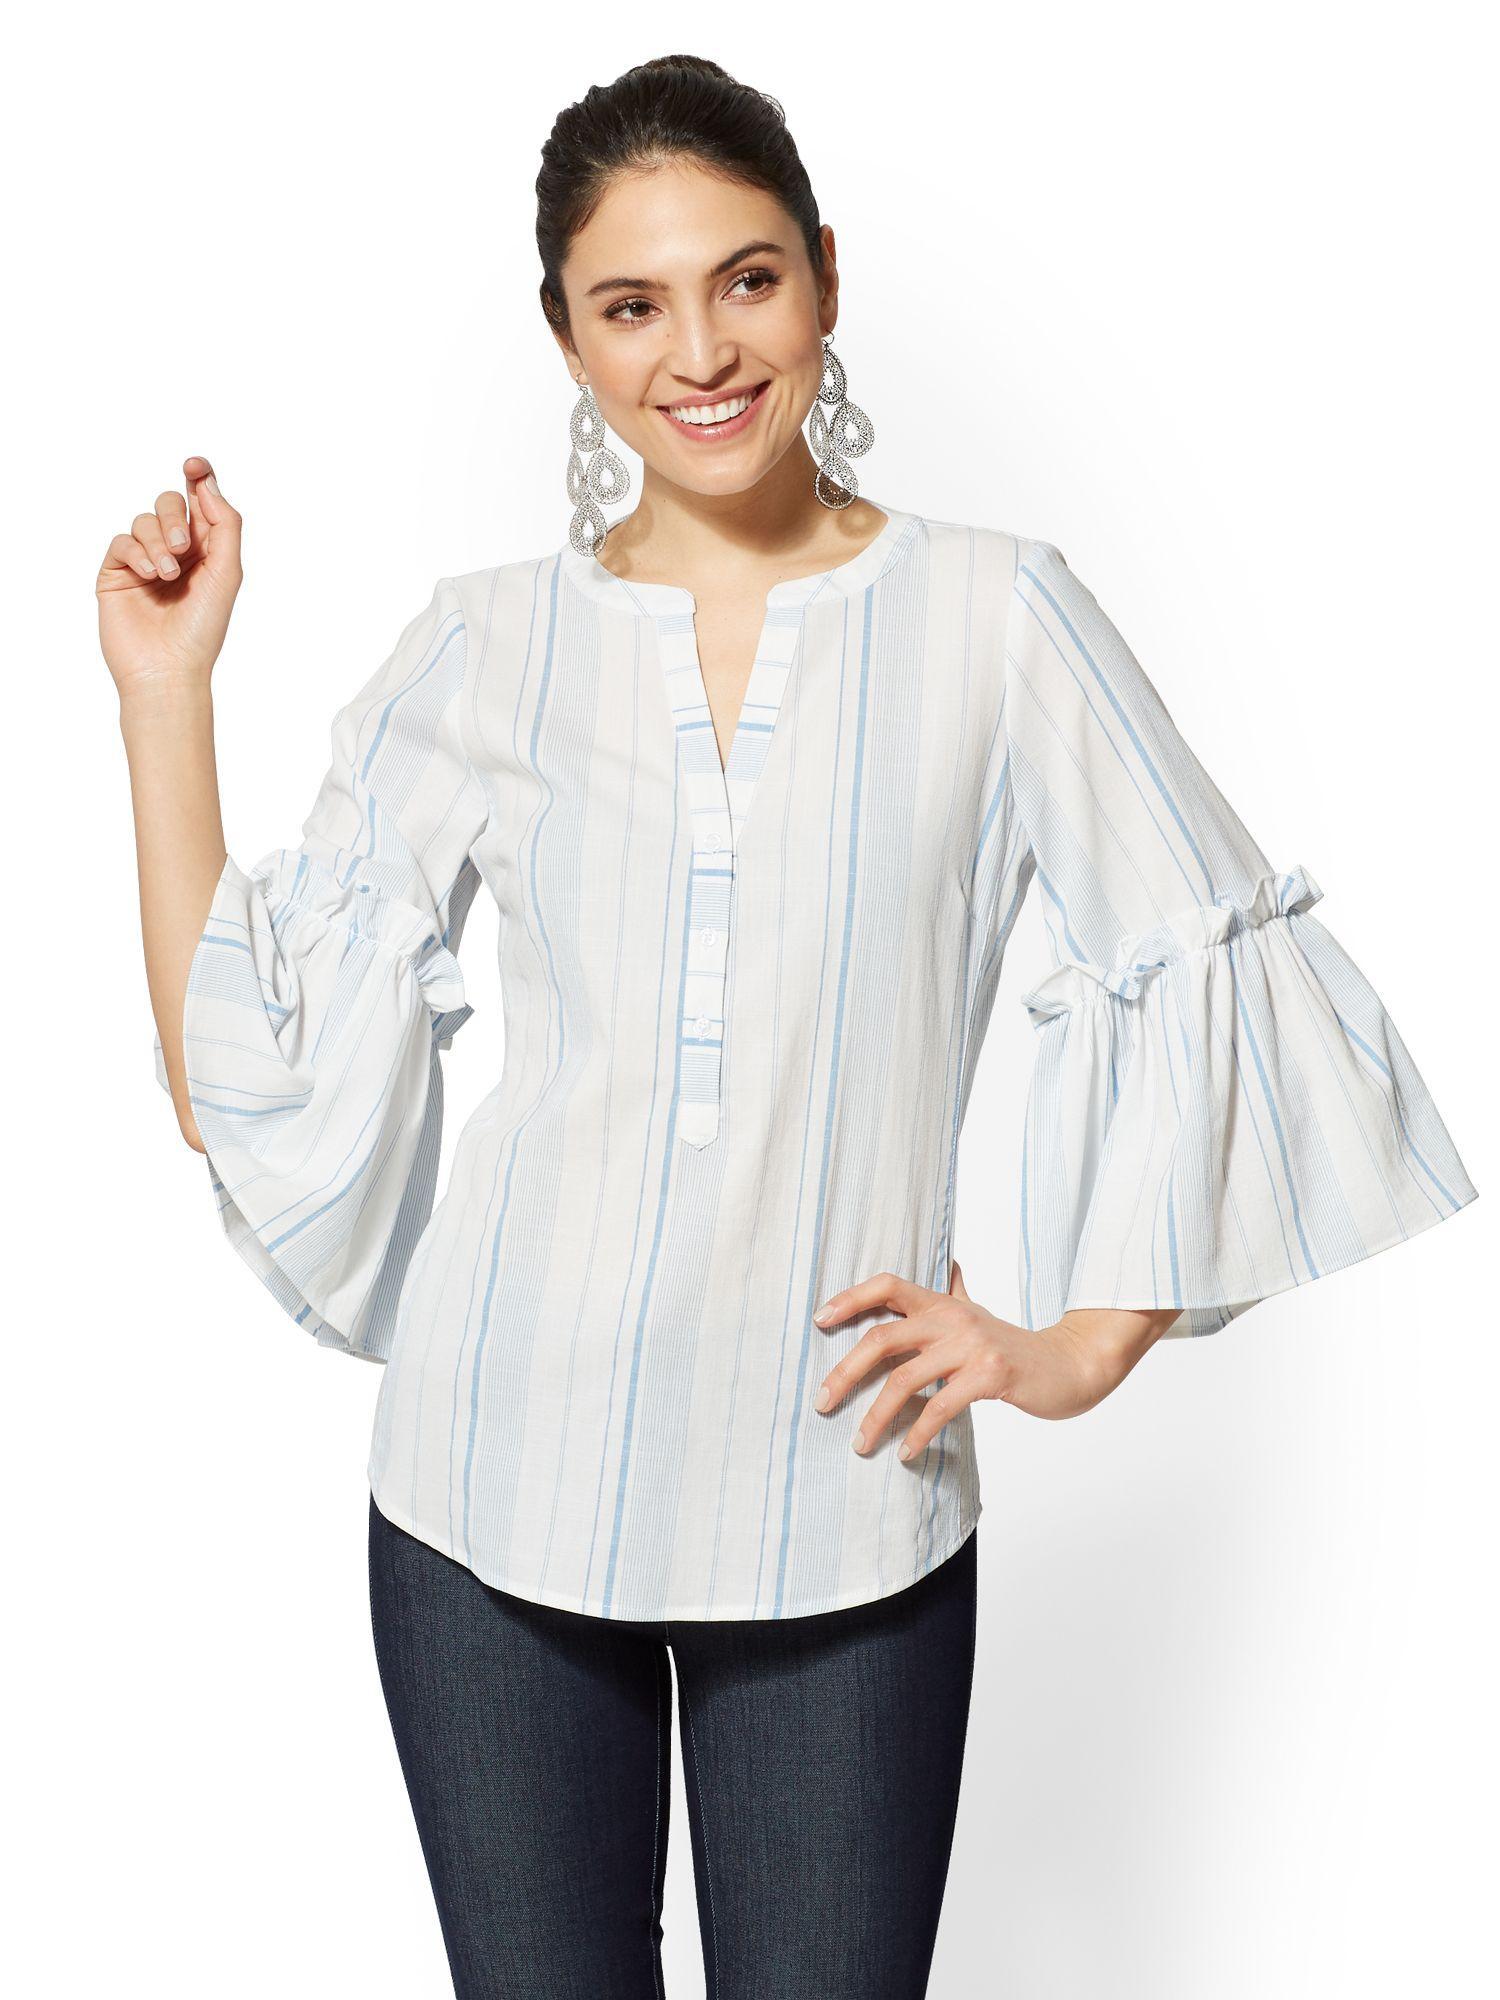 ce113fe01f New York & Company Striped Ruffled Popover Shirt - 7th Avenue in ...